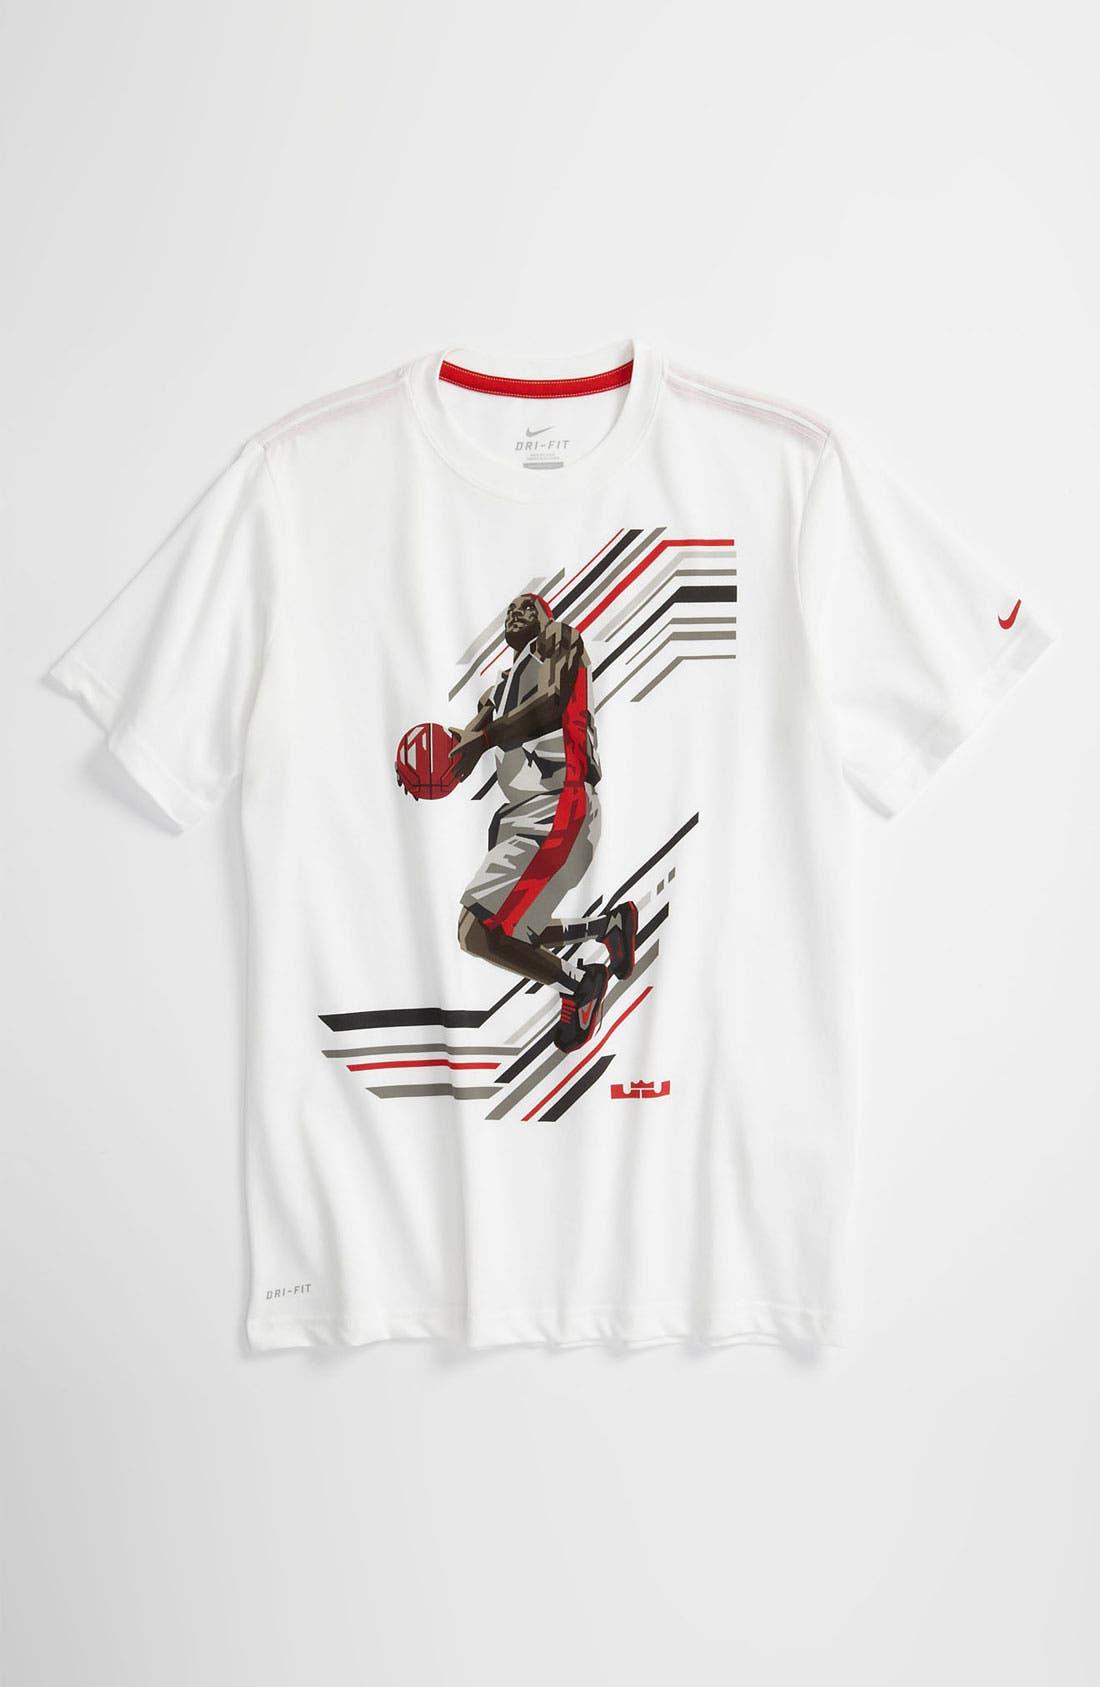 Alternate Image 1 Selected - Nike 'LeBron - Tech' Dri-FIT Cotton T-Shirt (Big Boys)